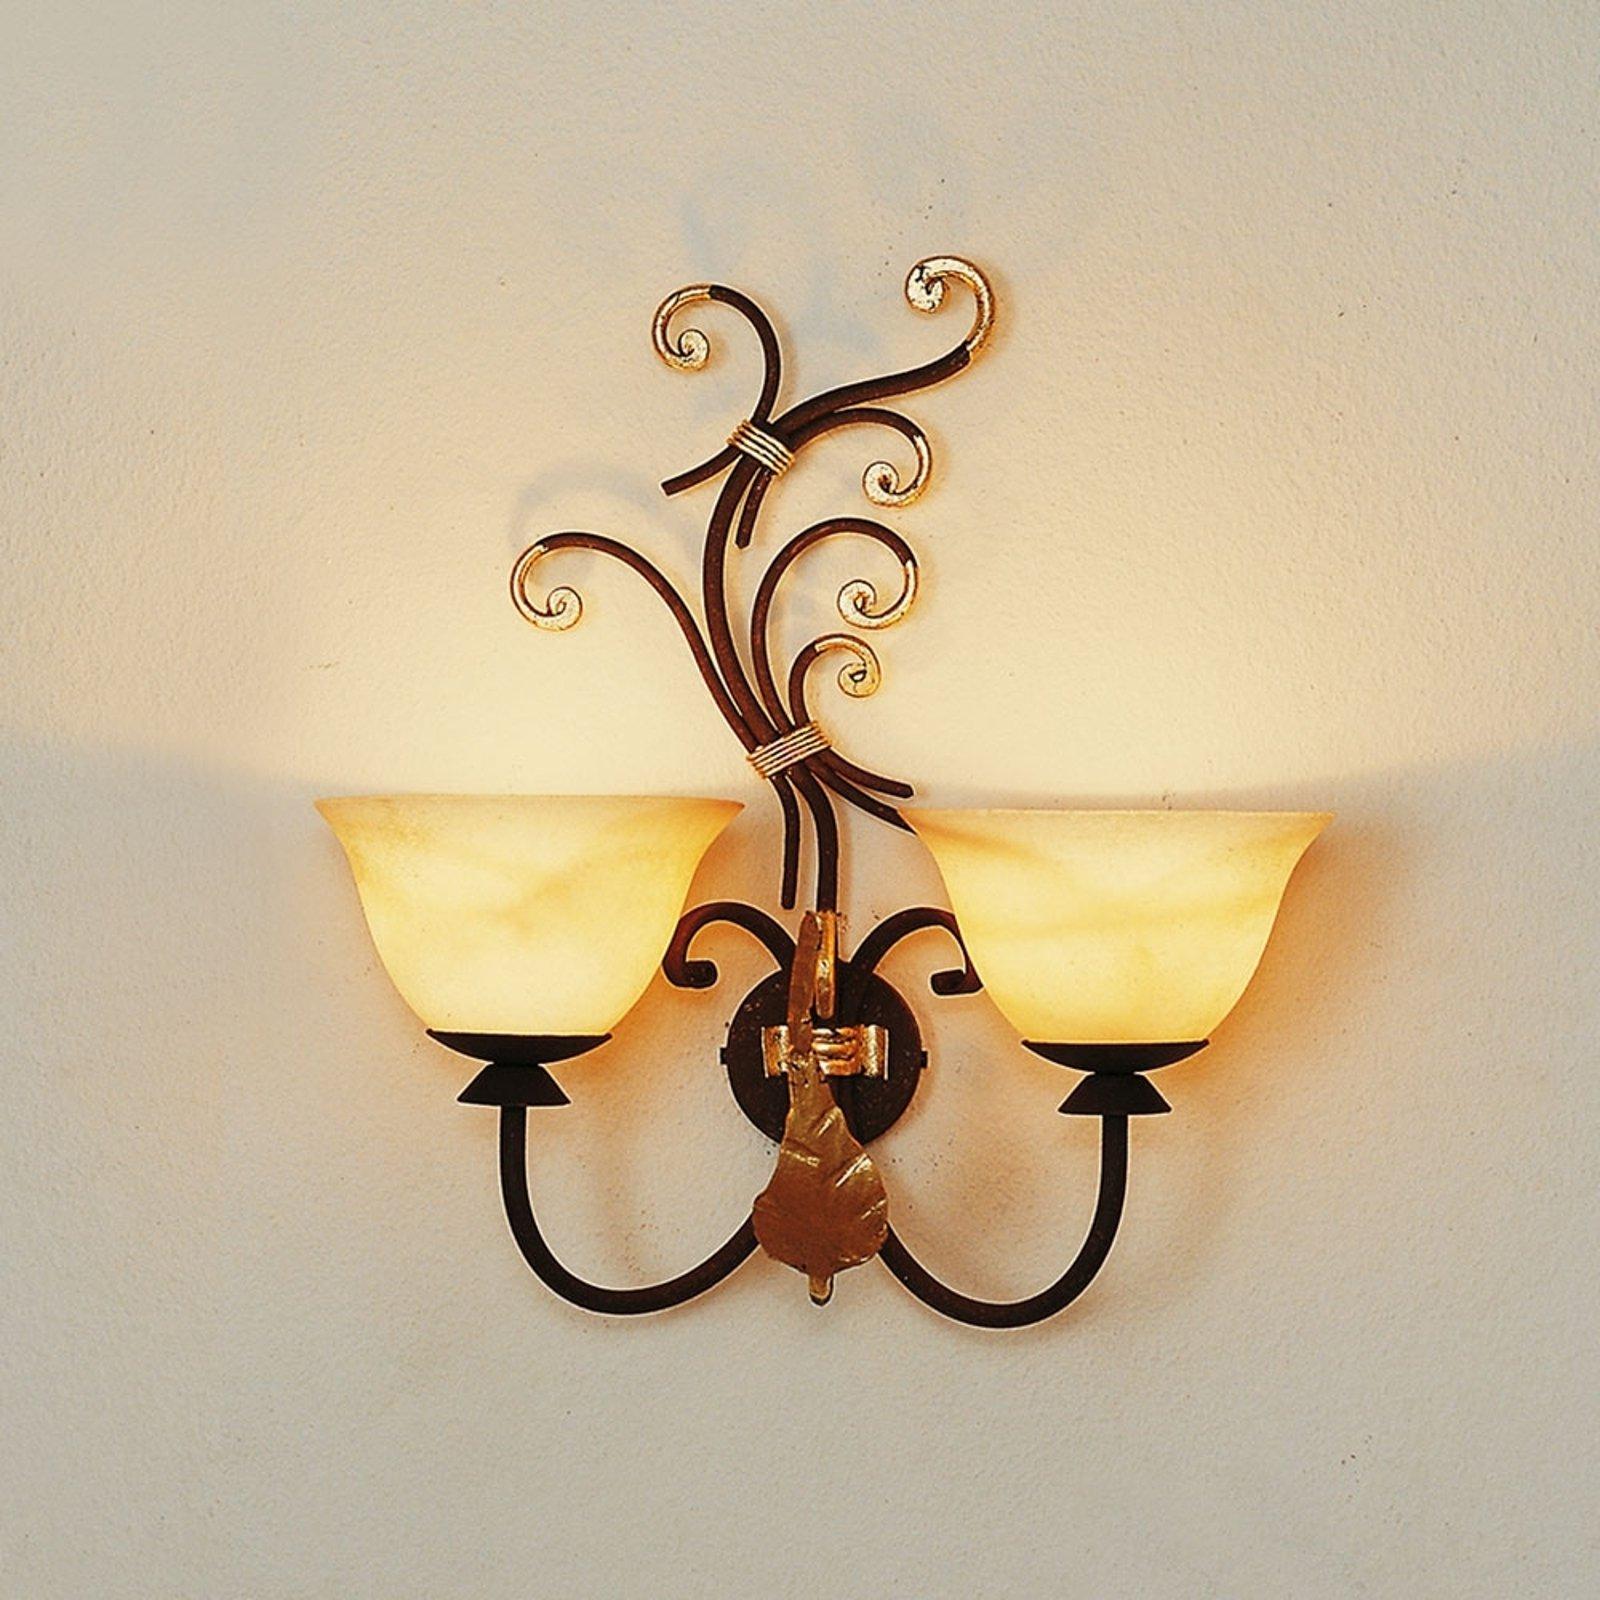 Vegglampe Florence med to lys